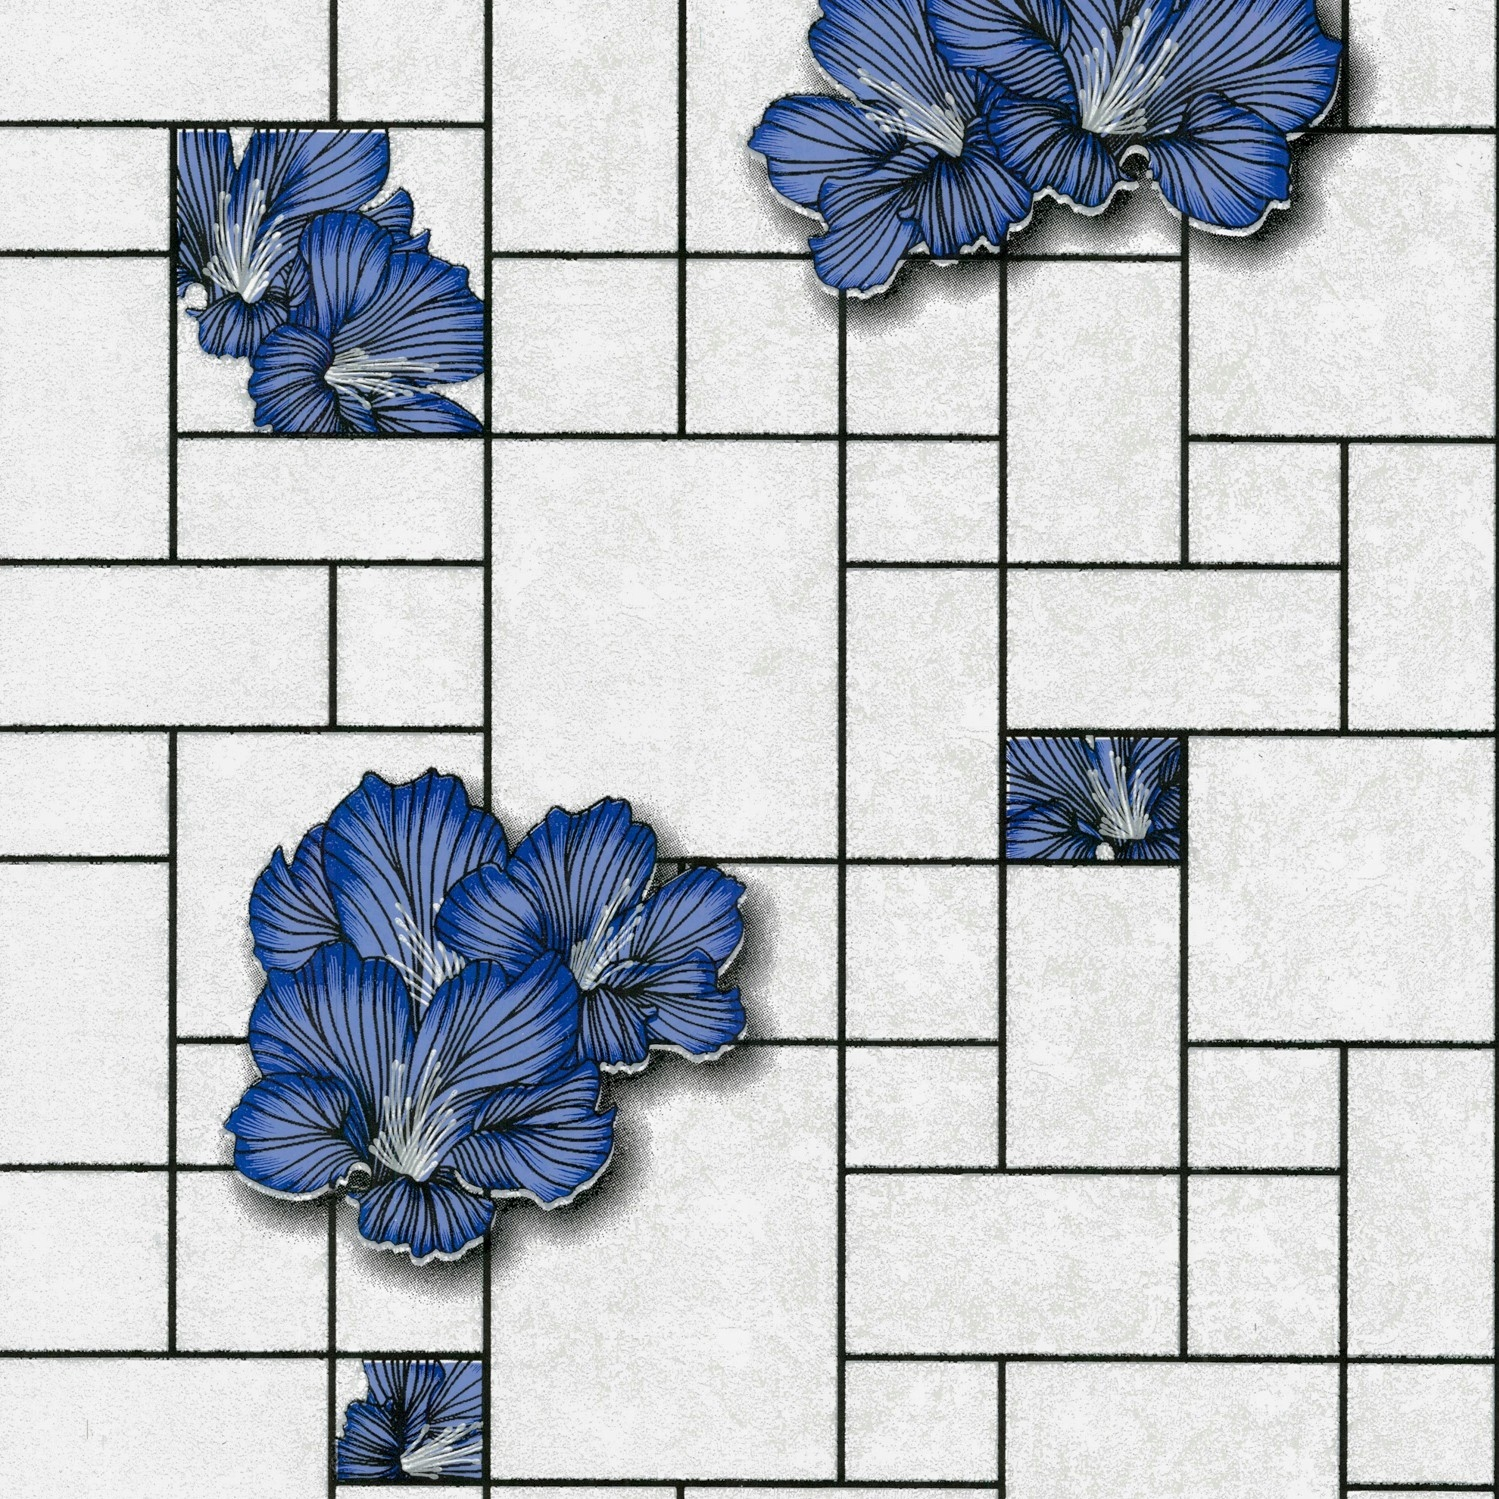 Кухня обои плитка квадраты цветы мрамор